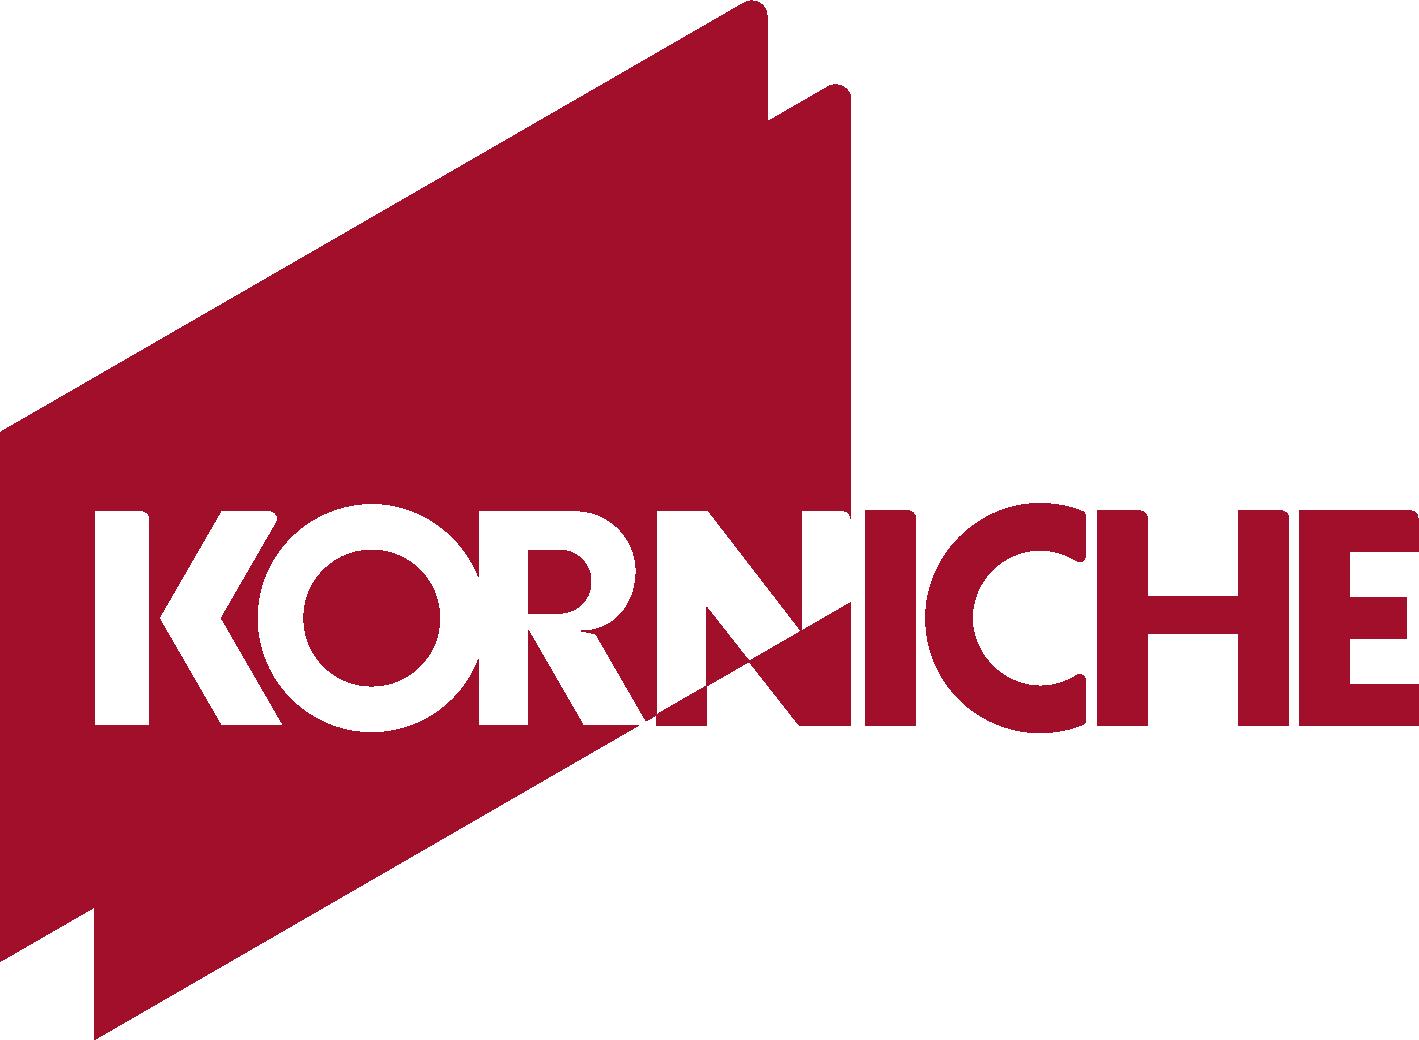 Korniche